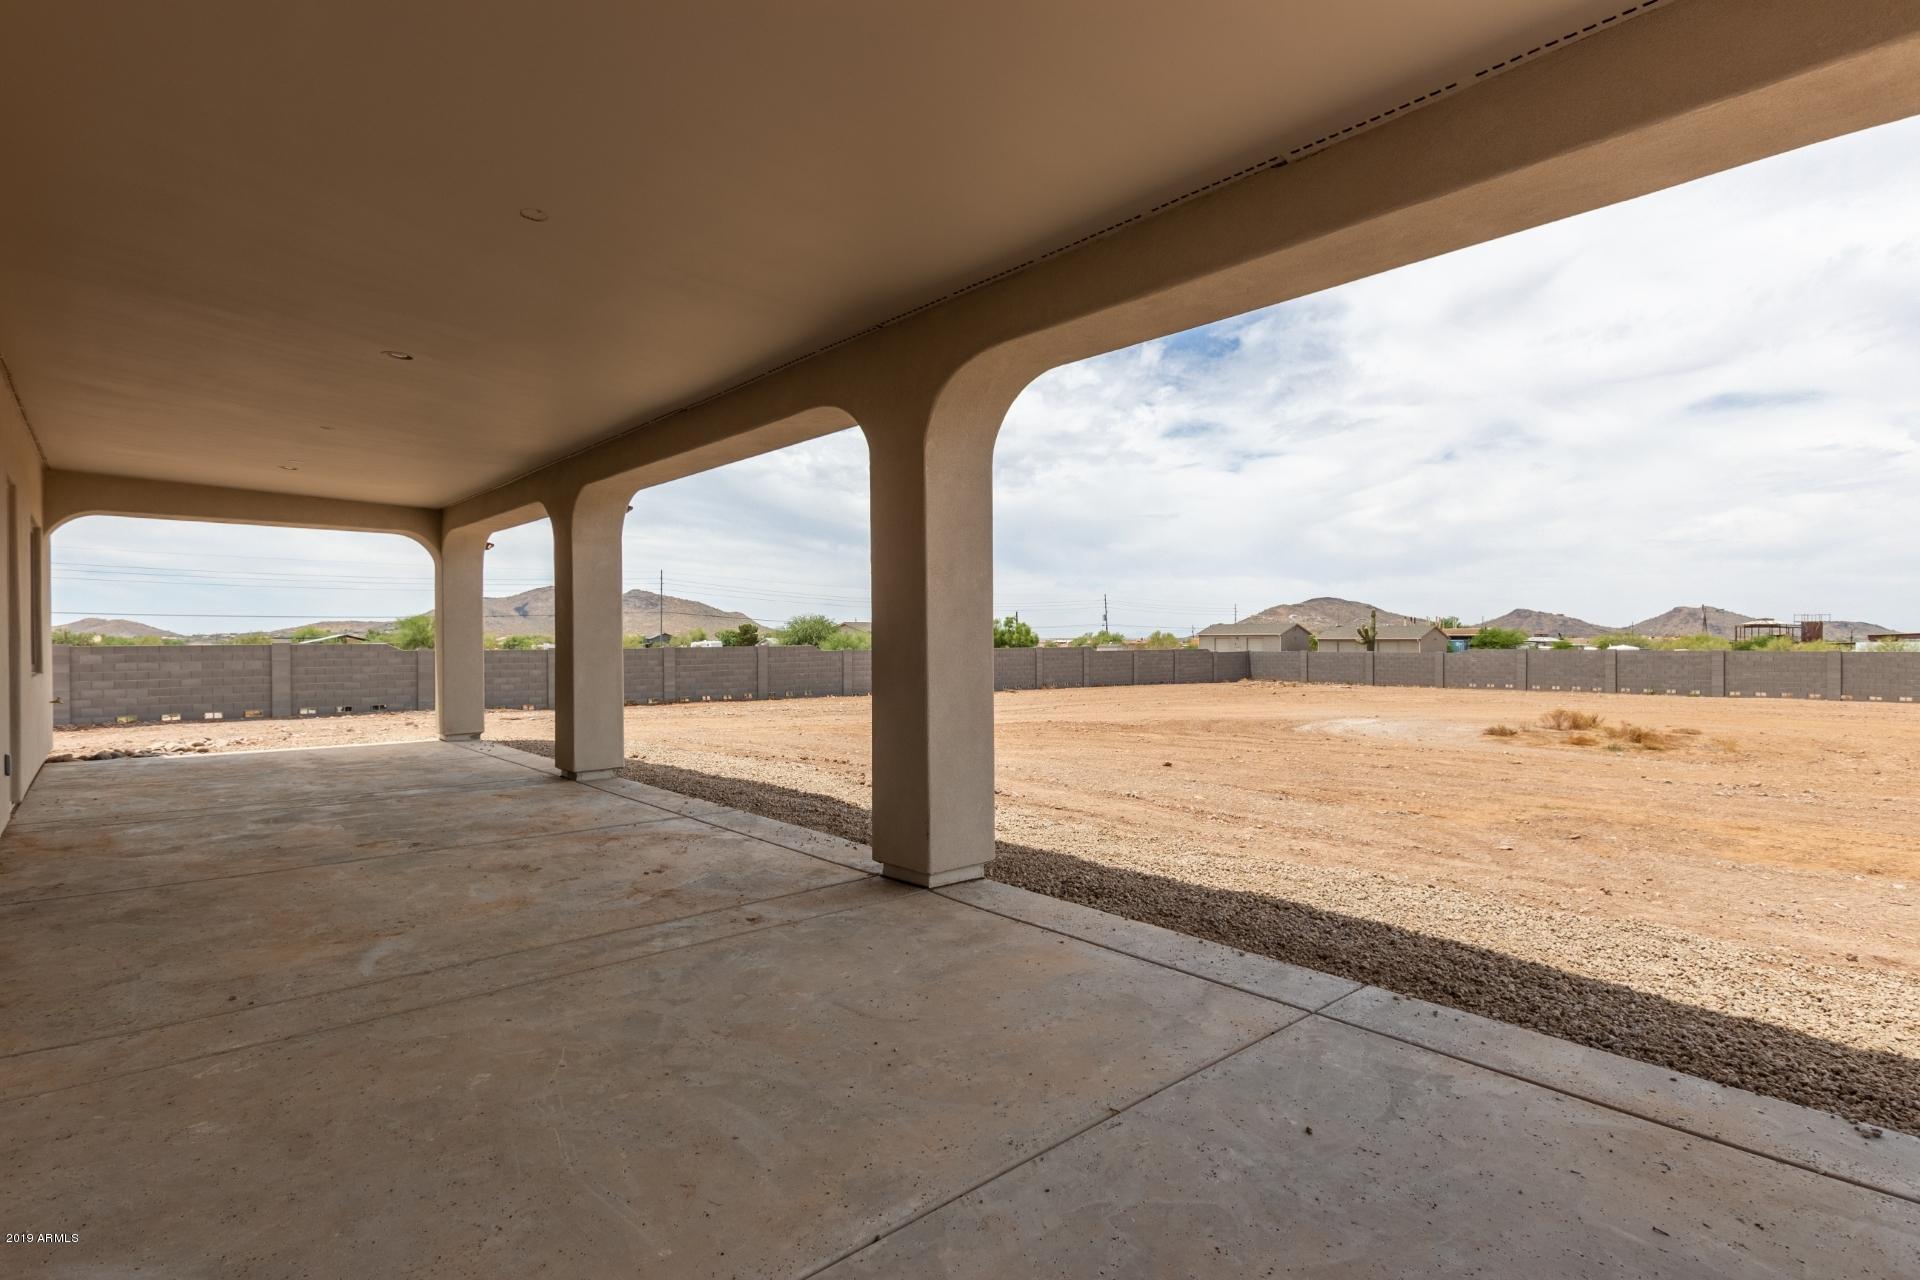 MLS 5887897 38710 N 15th Avenue Unit Lot 2, Desert Hills, AZ 85086 Desert Hills